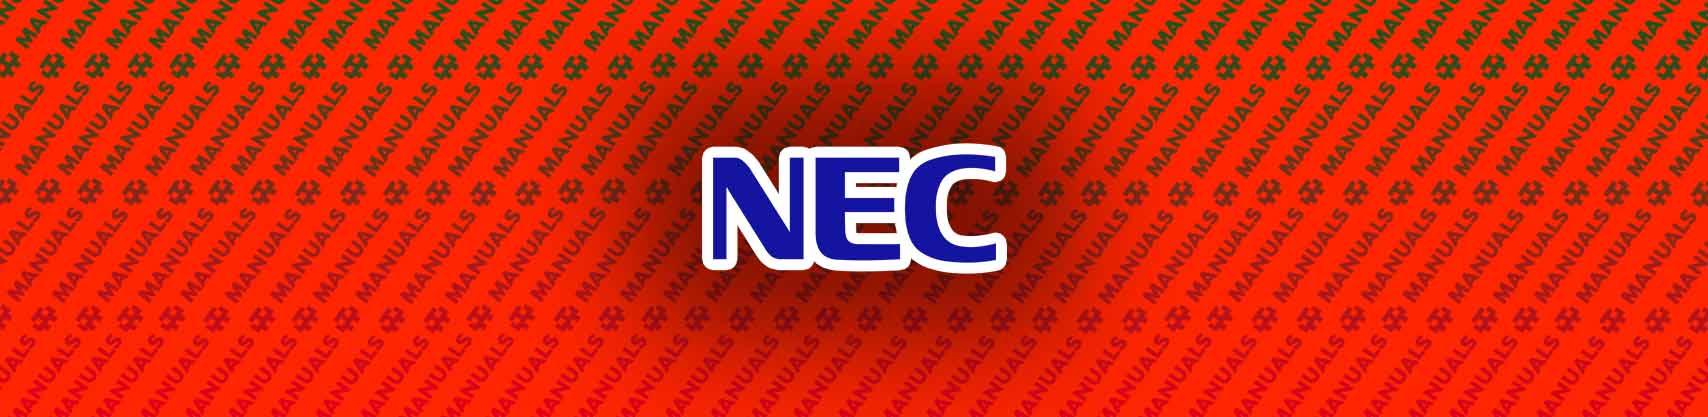 NEC DT300 Manual